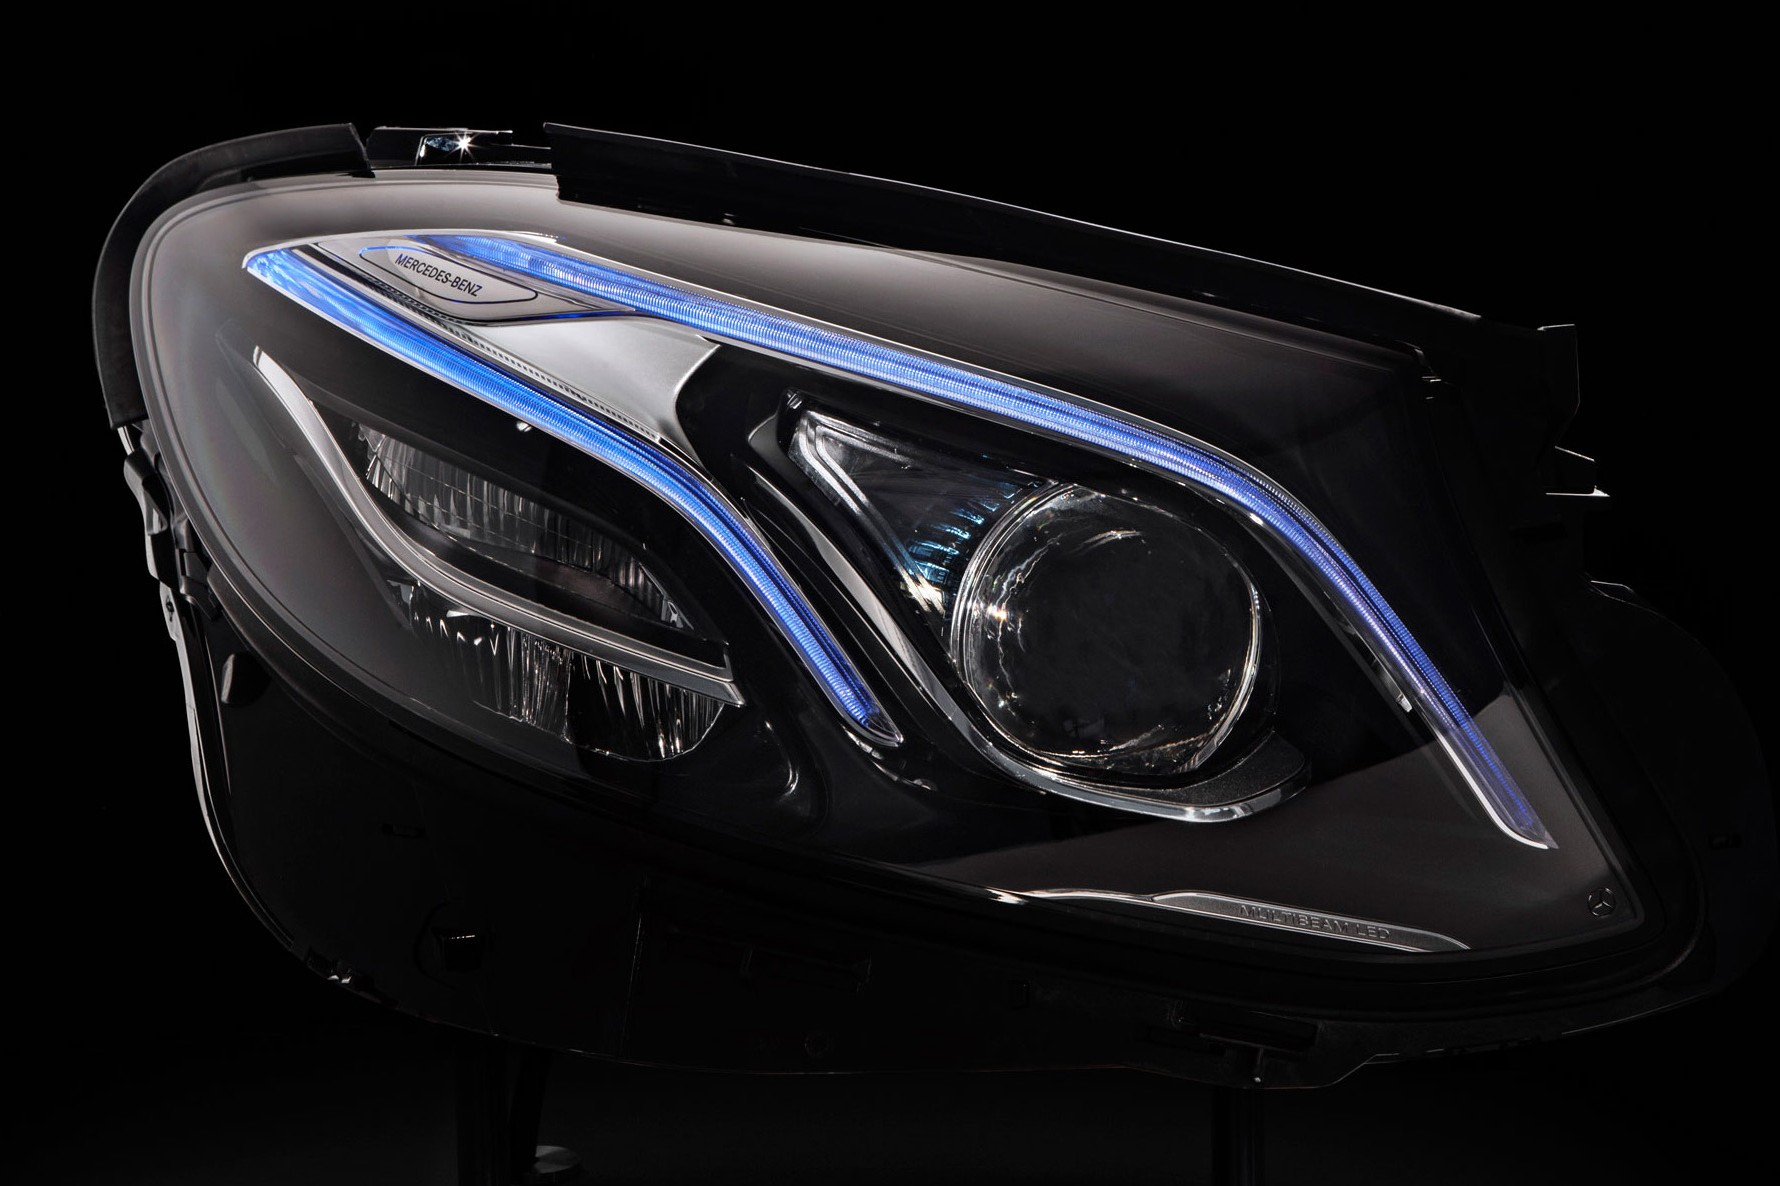 W213 Mercedes Benz E Class Tech Revealed Remote Parking